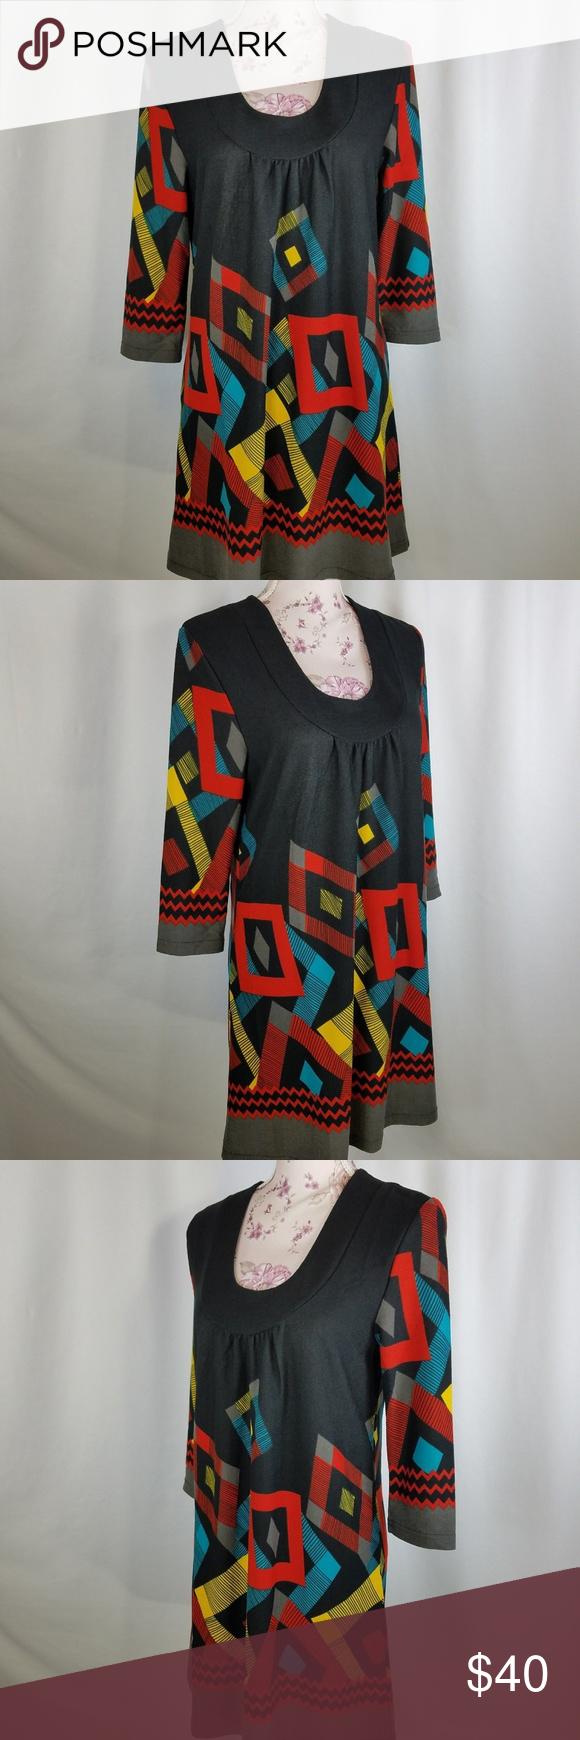 3a3ccdbe648 Papillon Black Geometric Long Sleeve Size M Dress Black Red Papillon Size M  Shift Dress Scoop